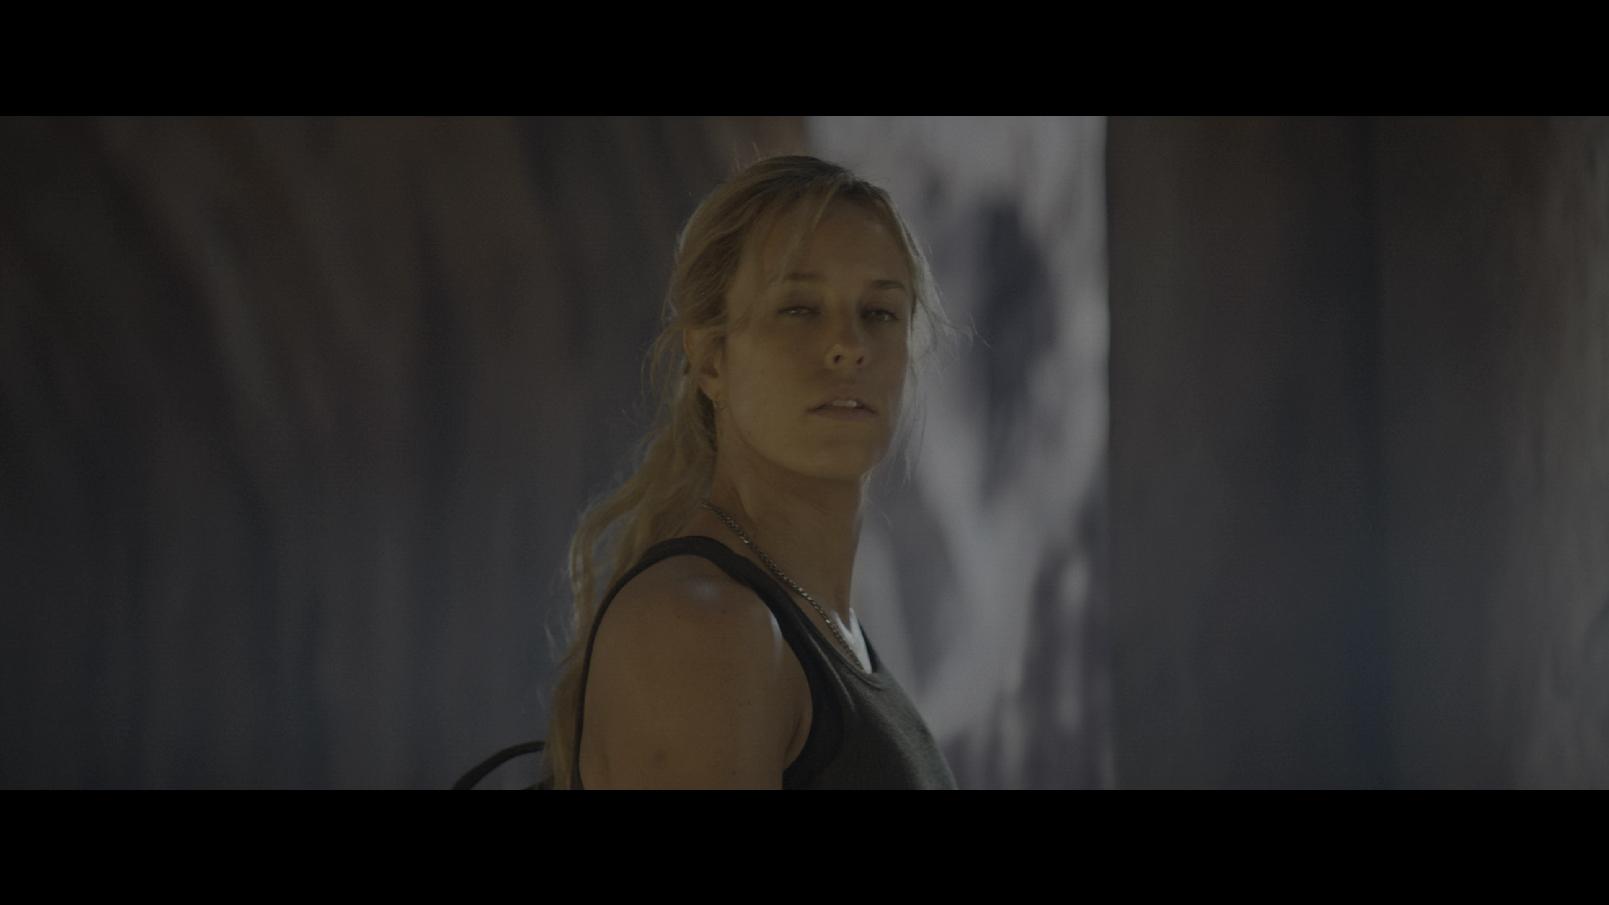 Mortal-Kombat-2021-2160p-HMAX-WEB-DL-DDP5-1-Atmos-HDR-HEVC-Telly-mkv-snapshot-00-45-07-866